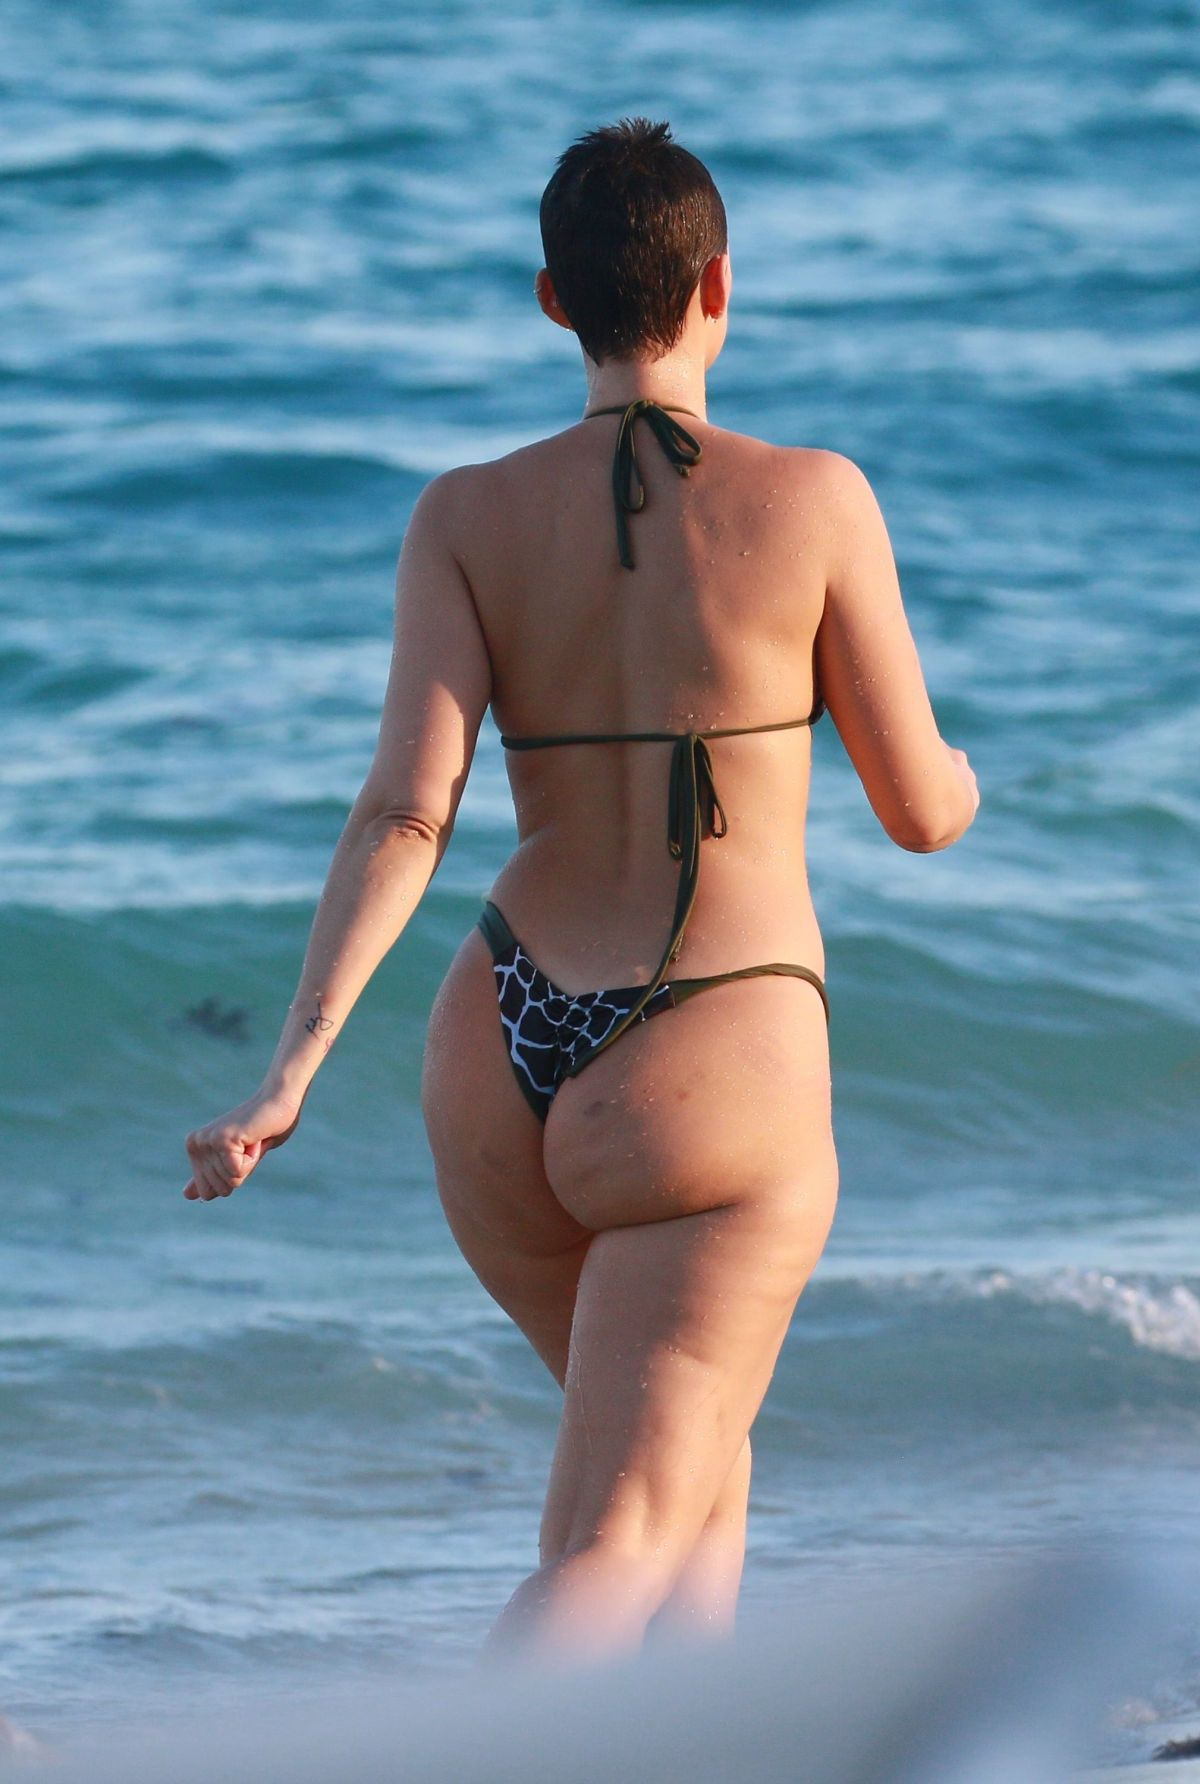 Fotos Julz Goddard naked (14 photo), Pussy, Hot, Twitter, lingerie 2019